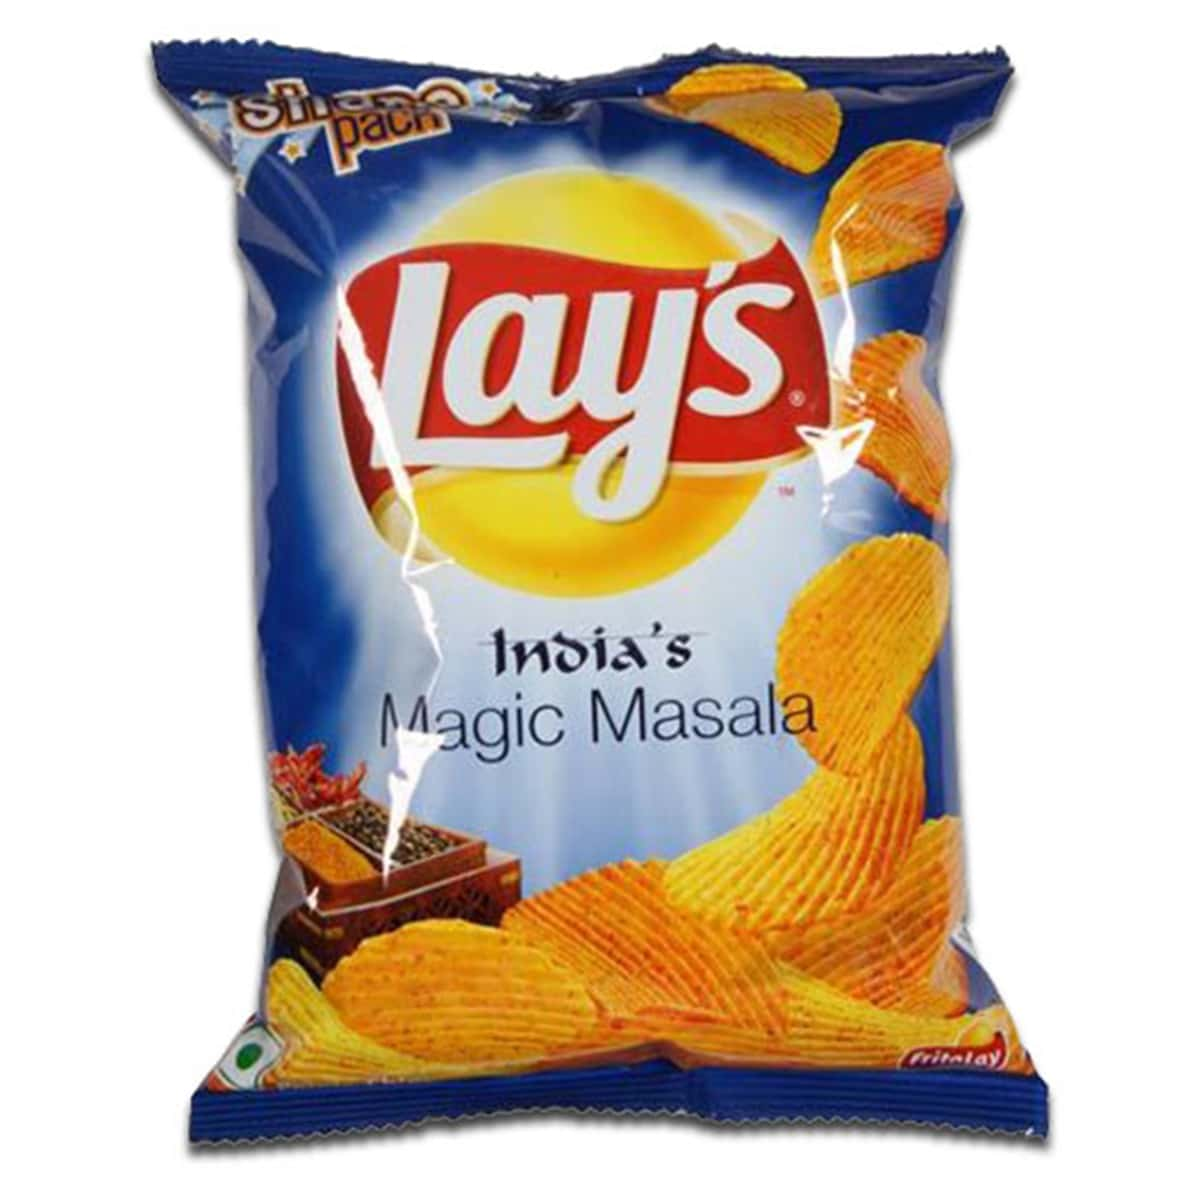 Buy Lays Indias Magic Masala (Potato Chips/wafers) - 52 gm